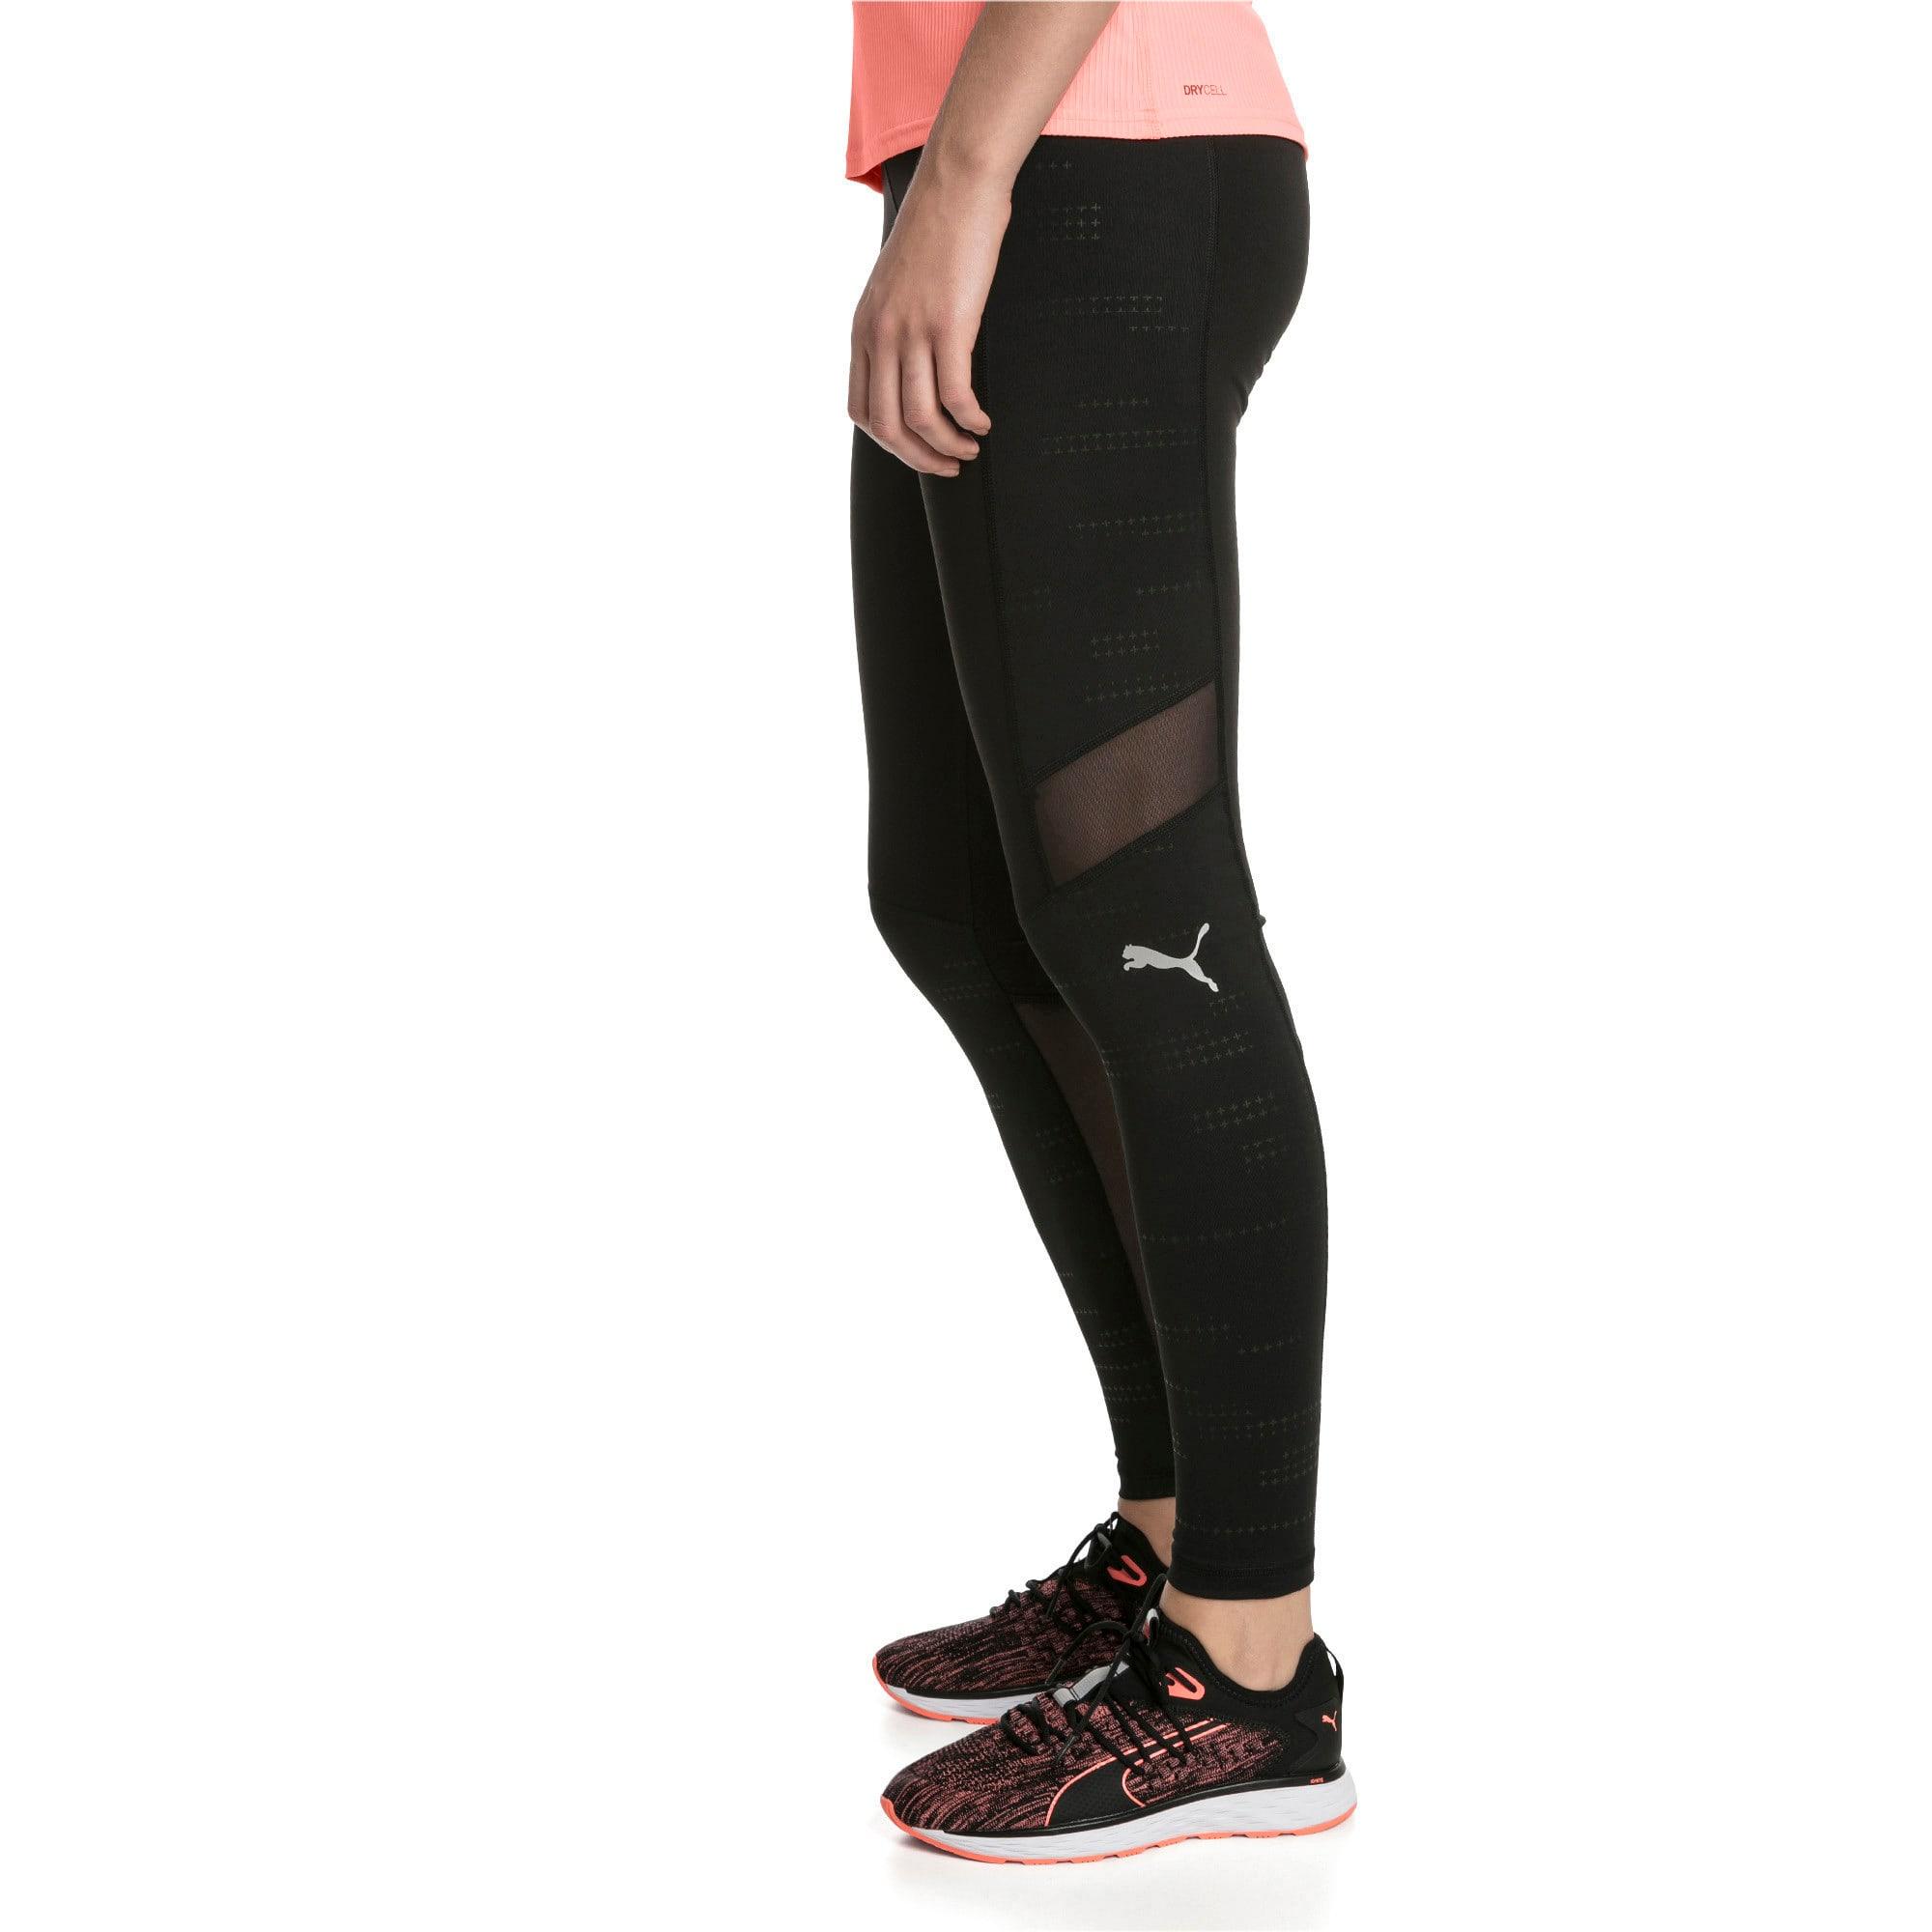 Thumbnail 1 of Ignite Women's Running Leggings, Puma Black, medium-IND